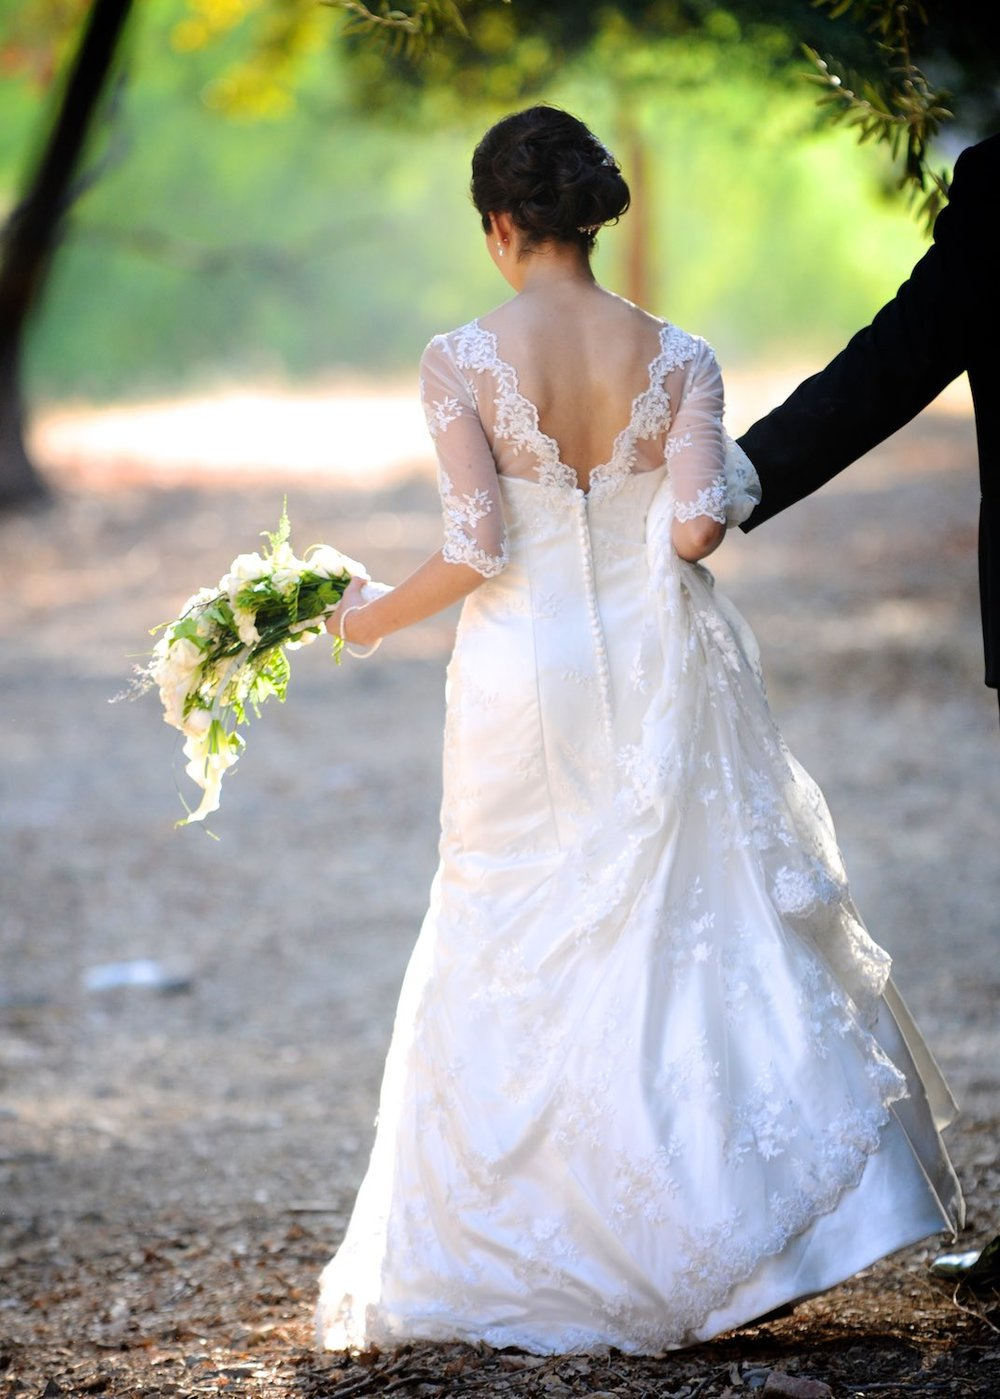 oc-wedding-michal-pfeil-08.jpg